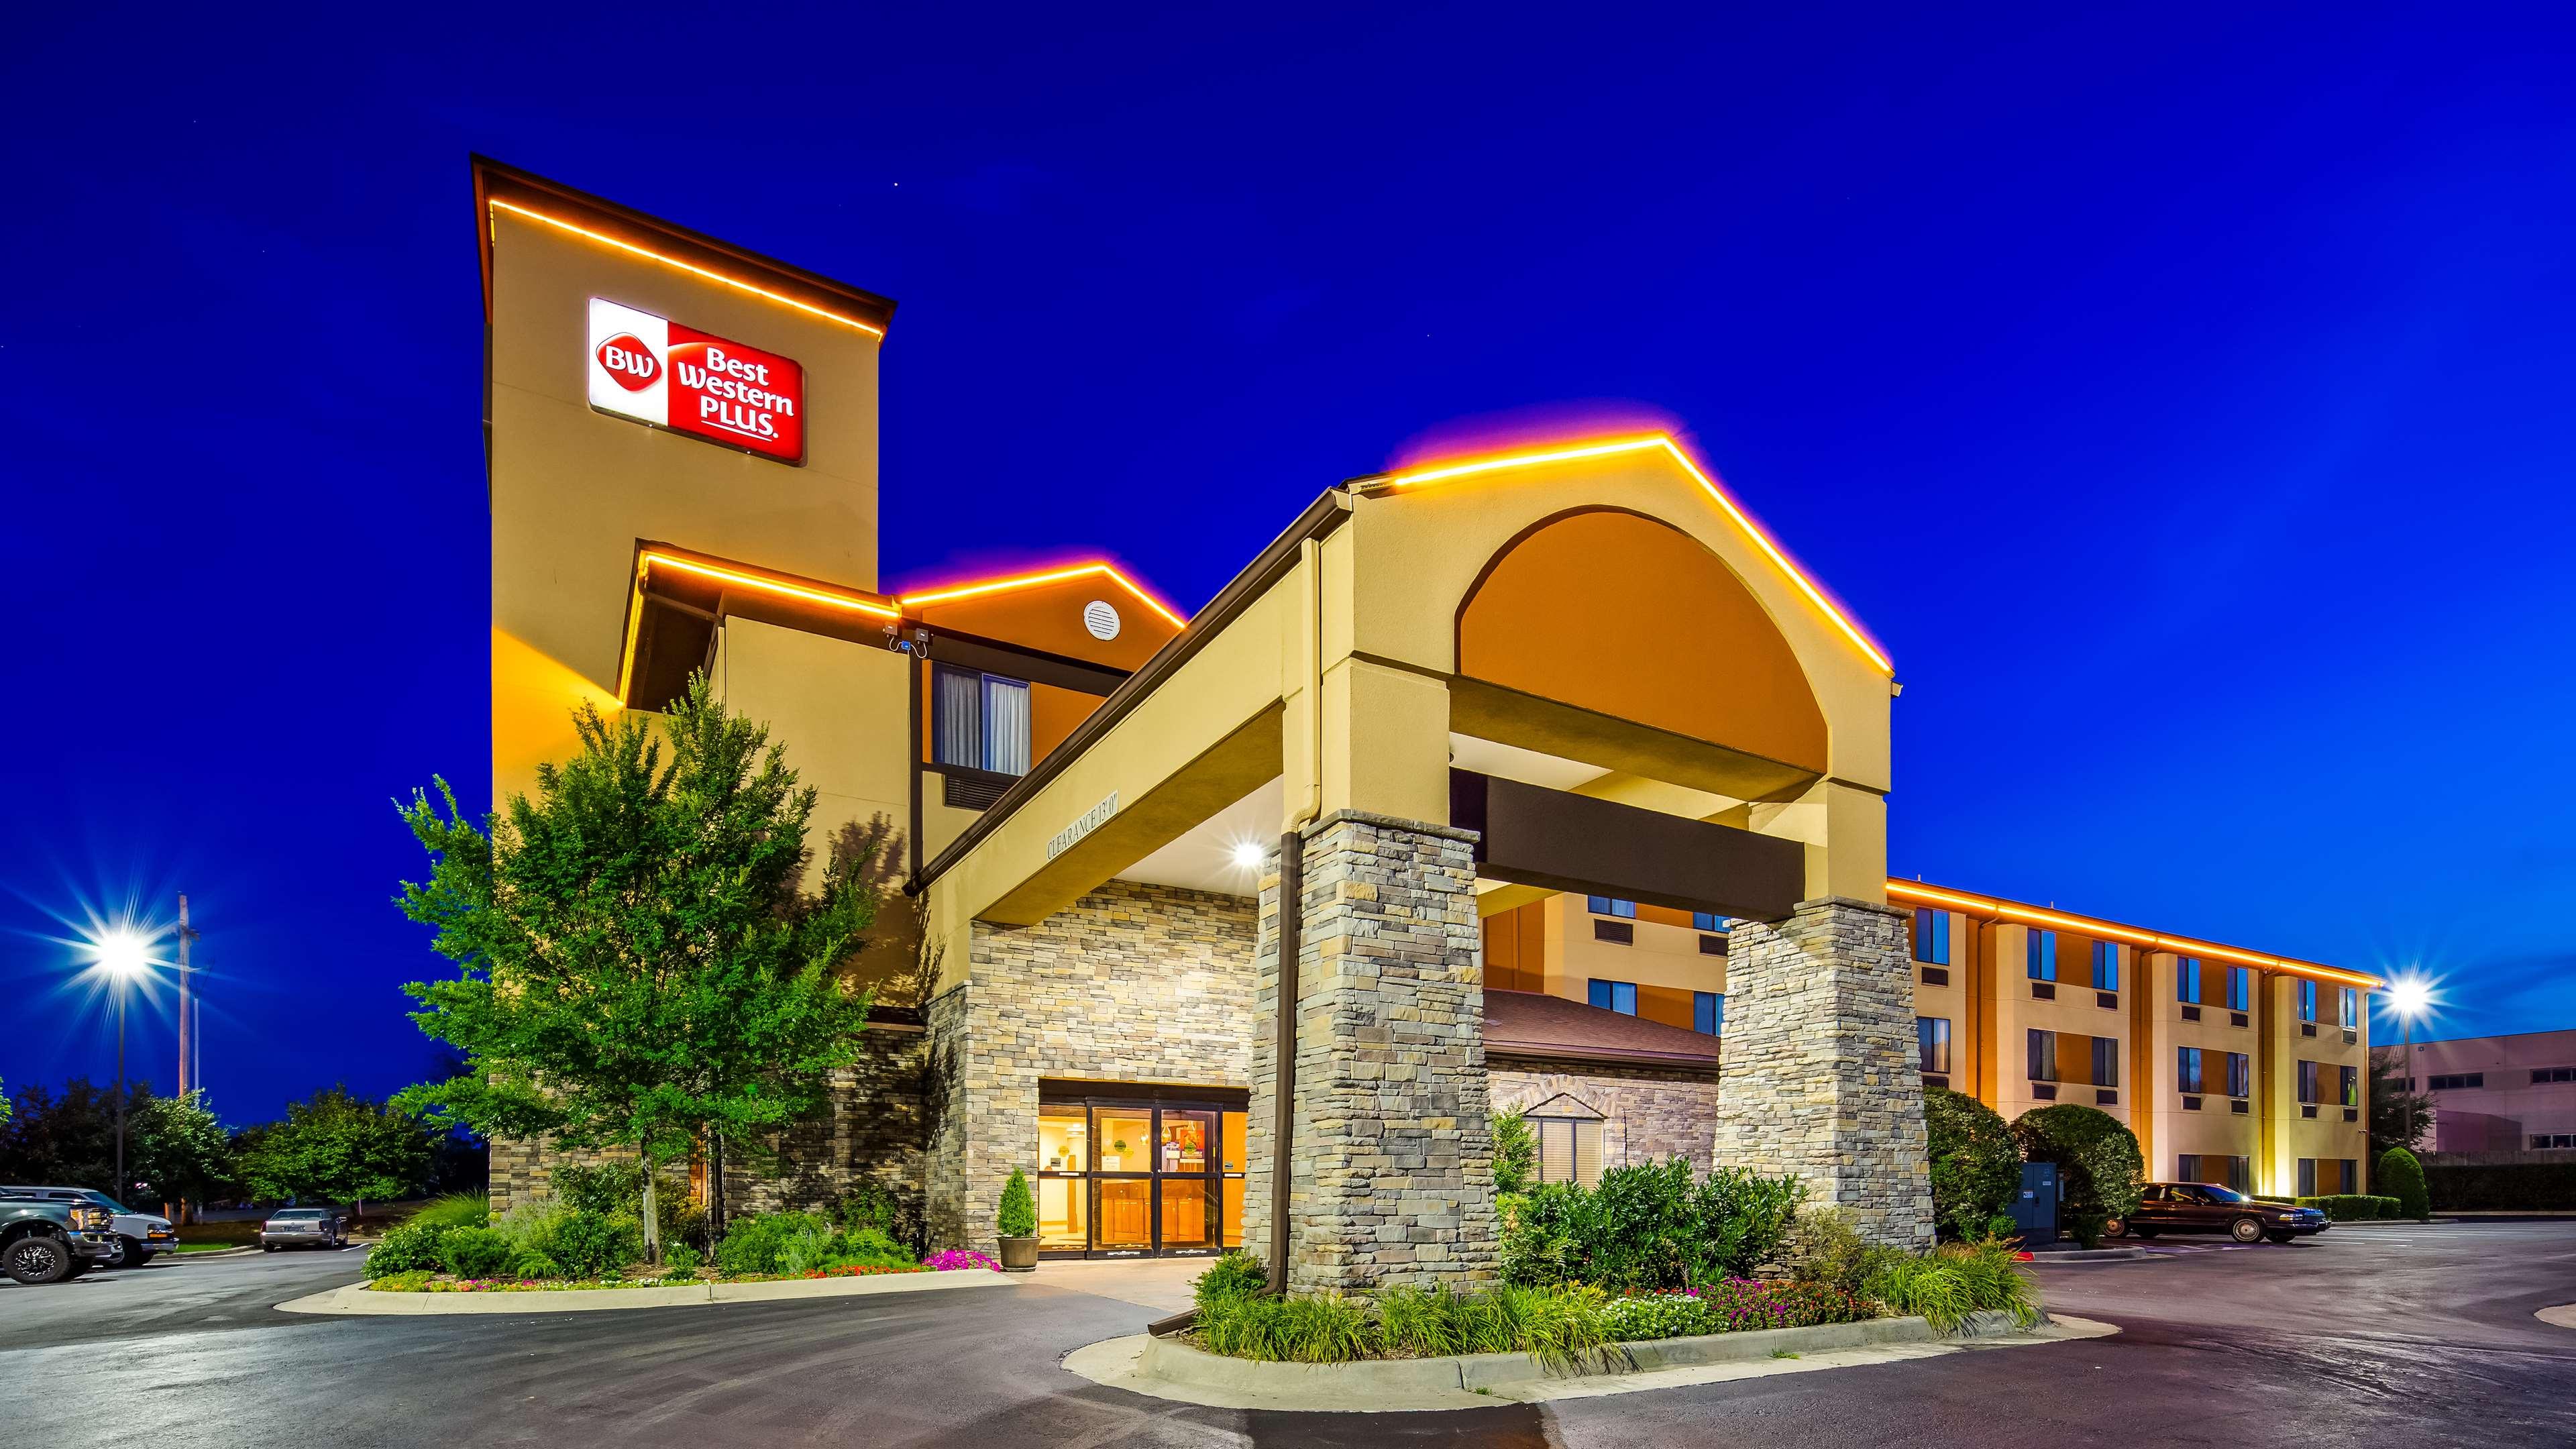 Best Western Plus Woodland Hills Hotel & Suites image 0